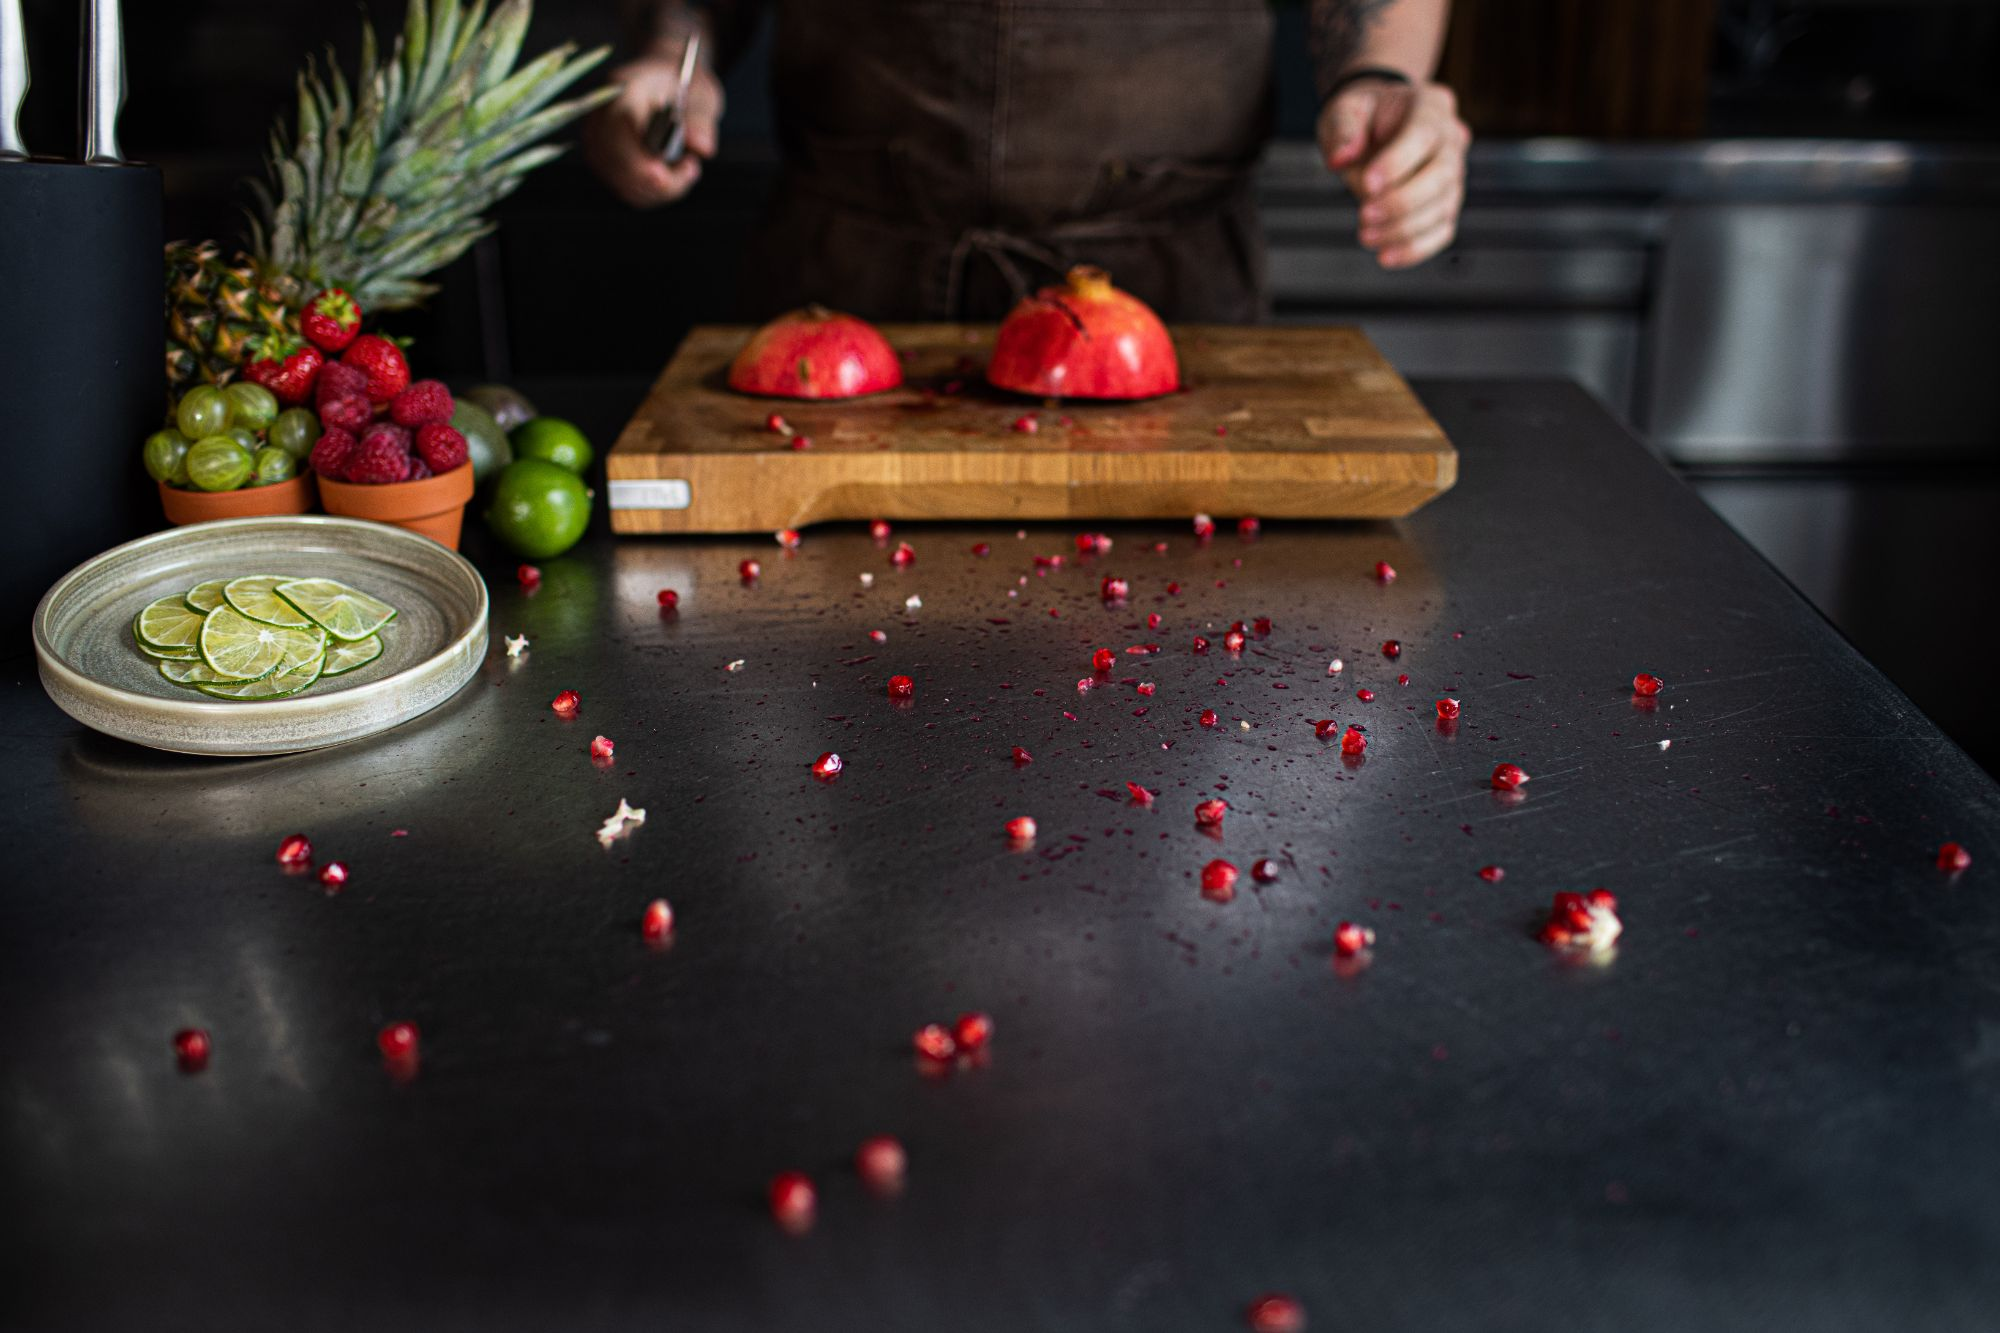 Midlands food photographer